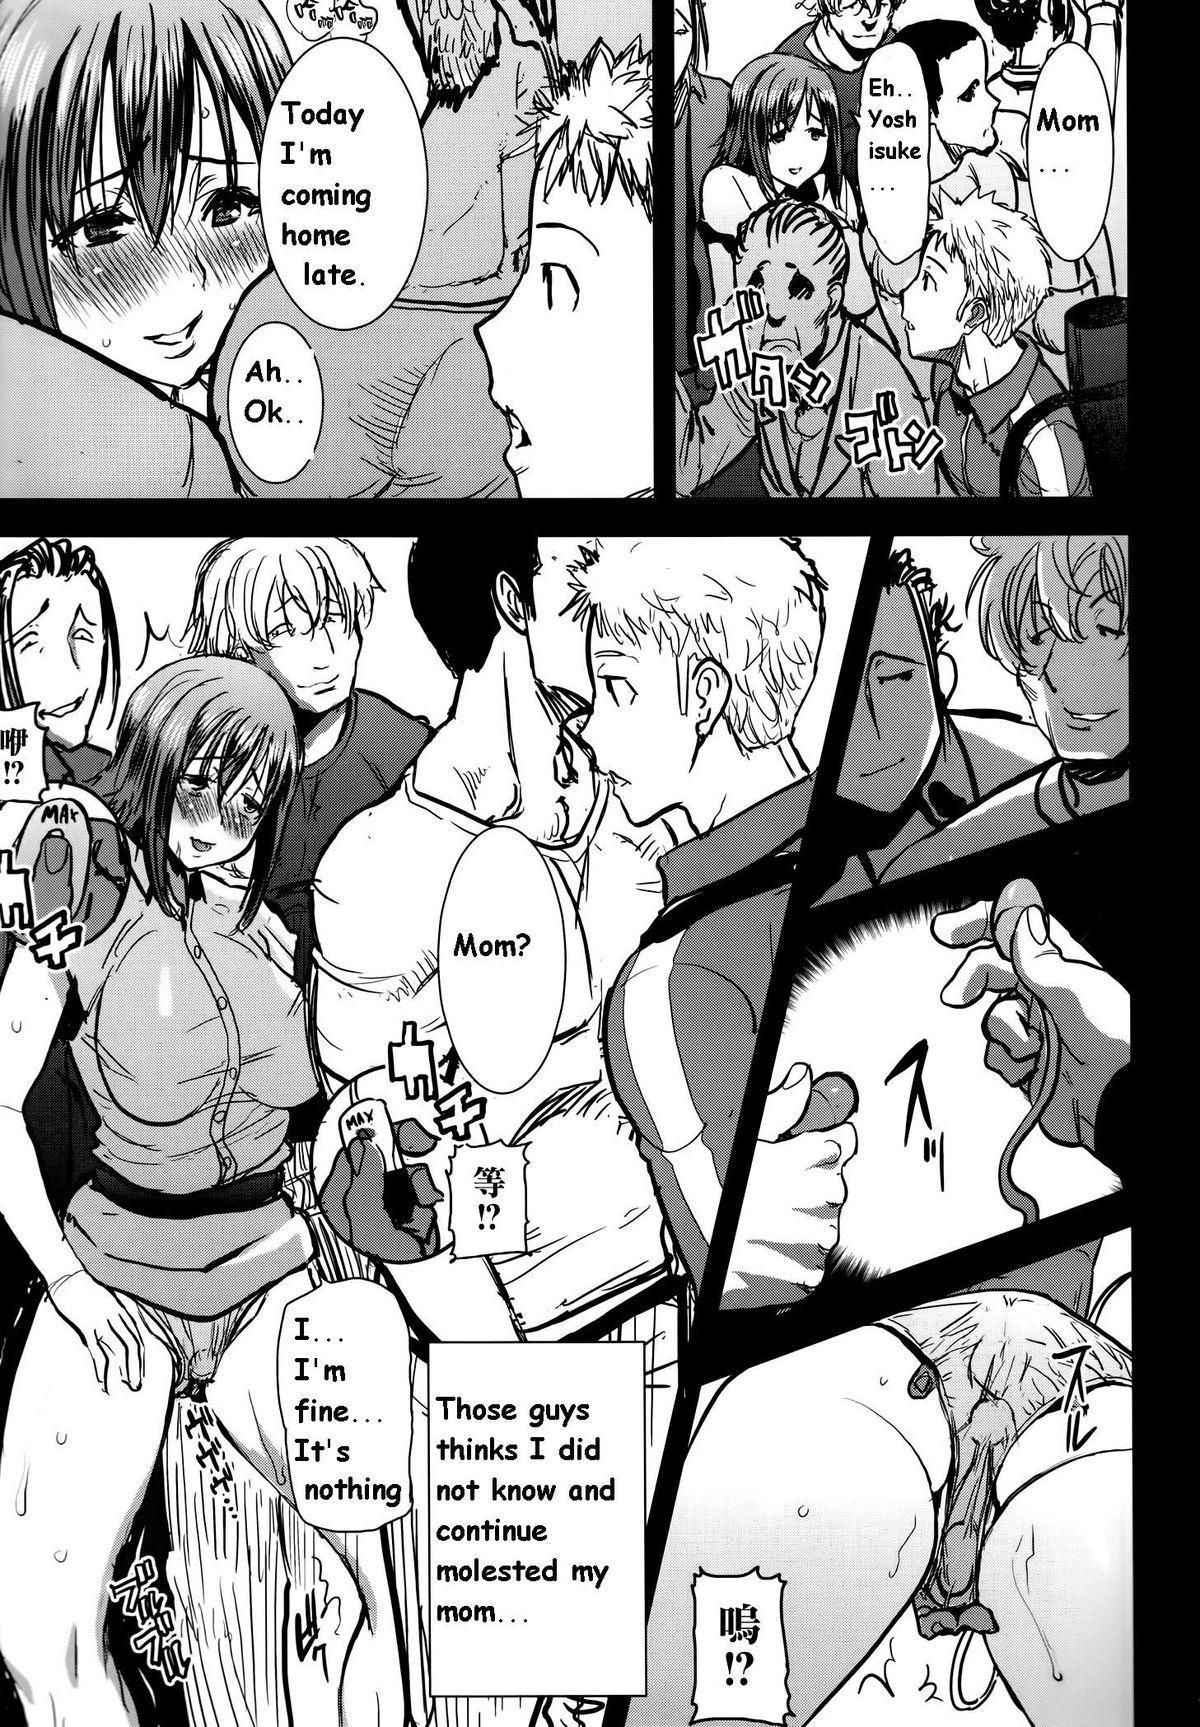 UnSweet Haha Wakui Kazumi Plus SIDE Hitori Musuko Ryousuke   Unsweet Mom Aimi Wakui - SIDE her only son Yoshisuke 14